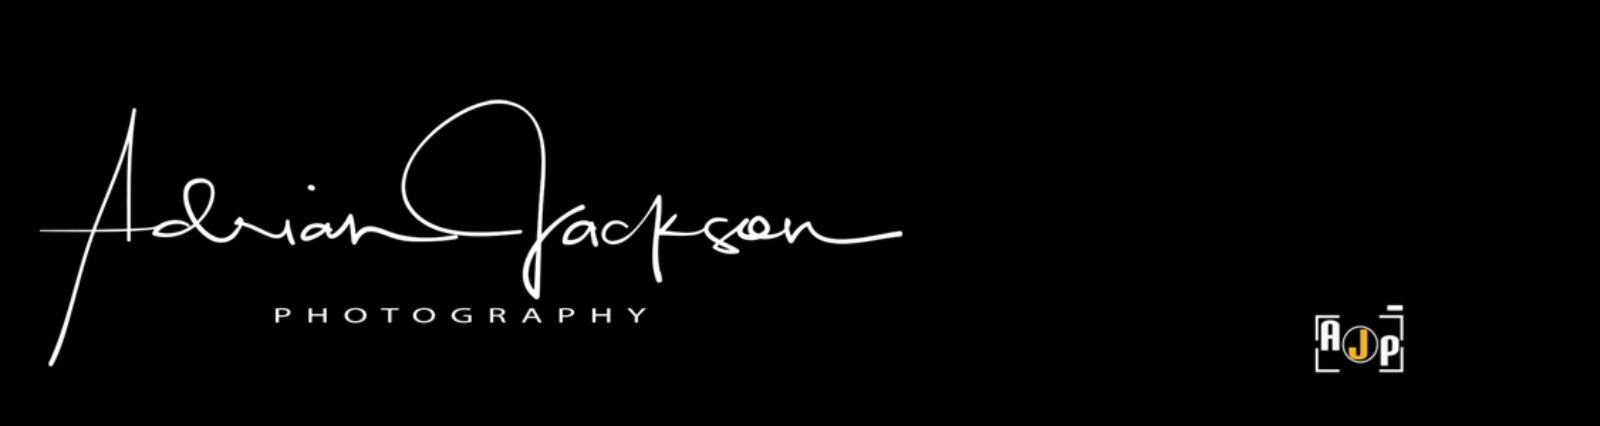 Adrian Jackson Photography